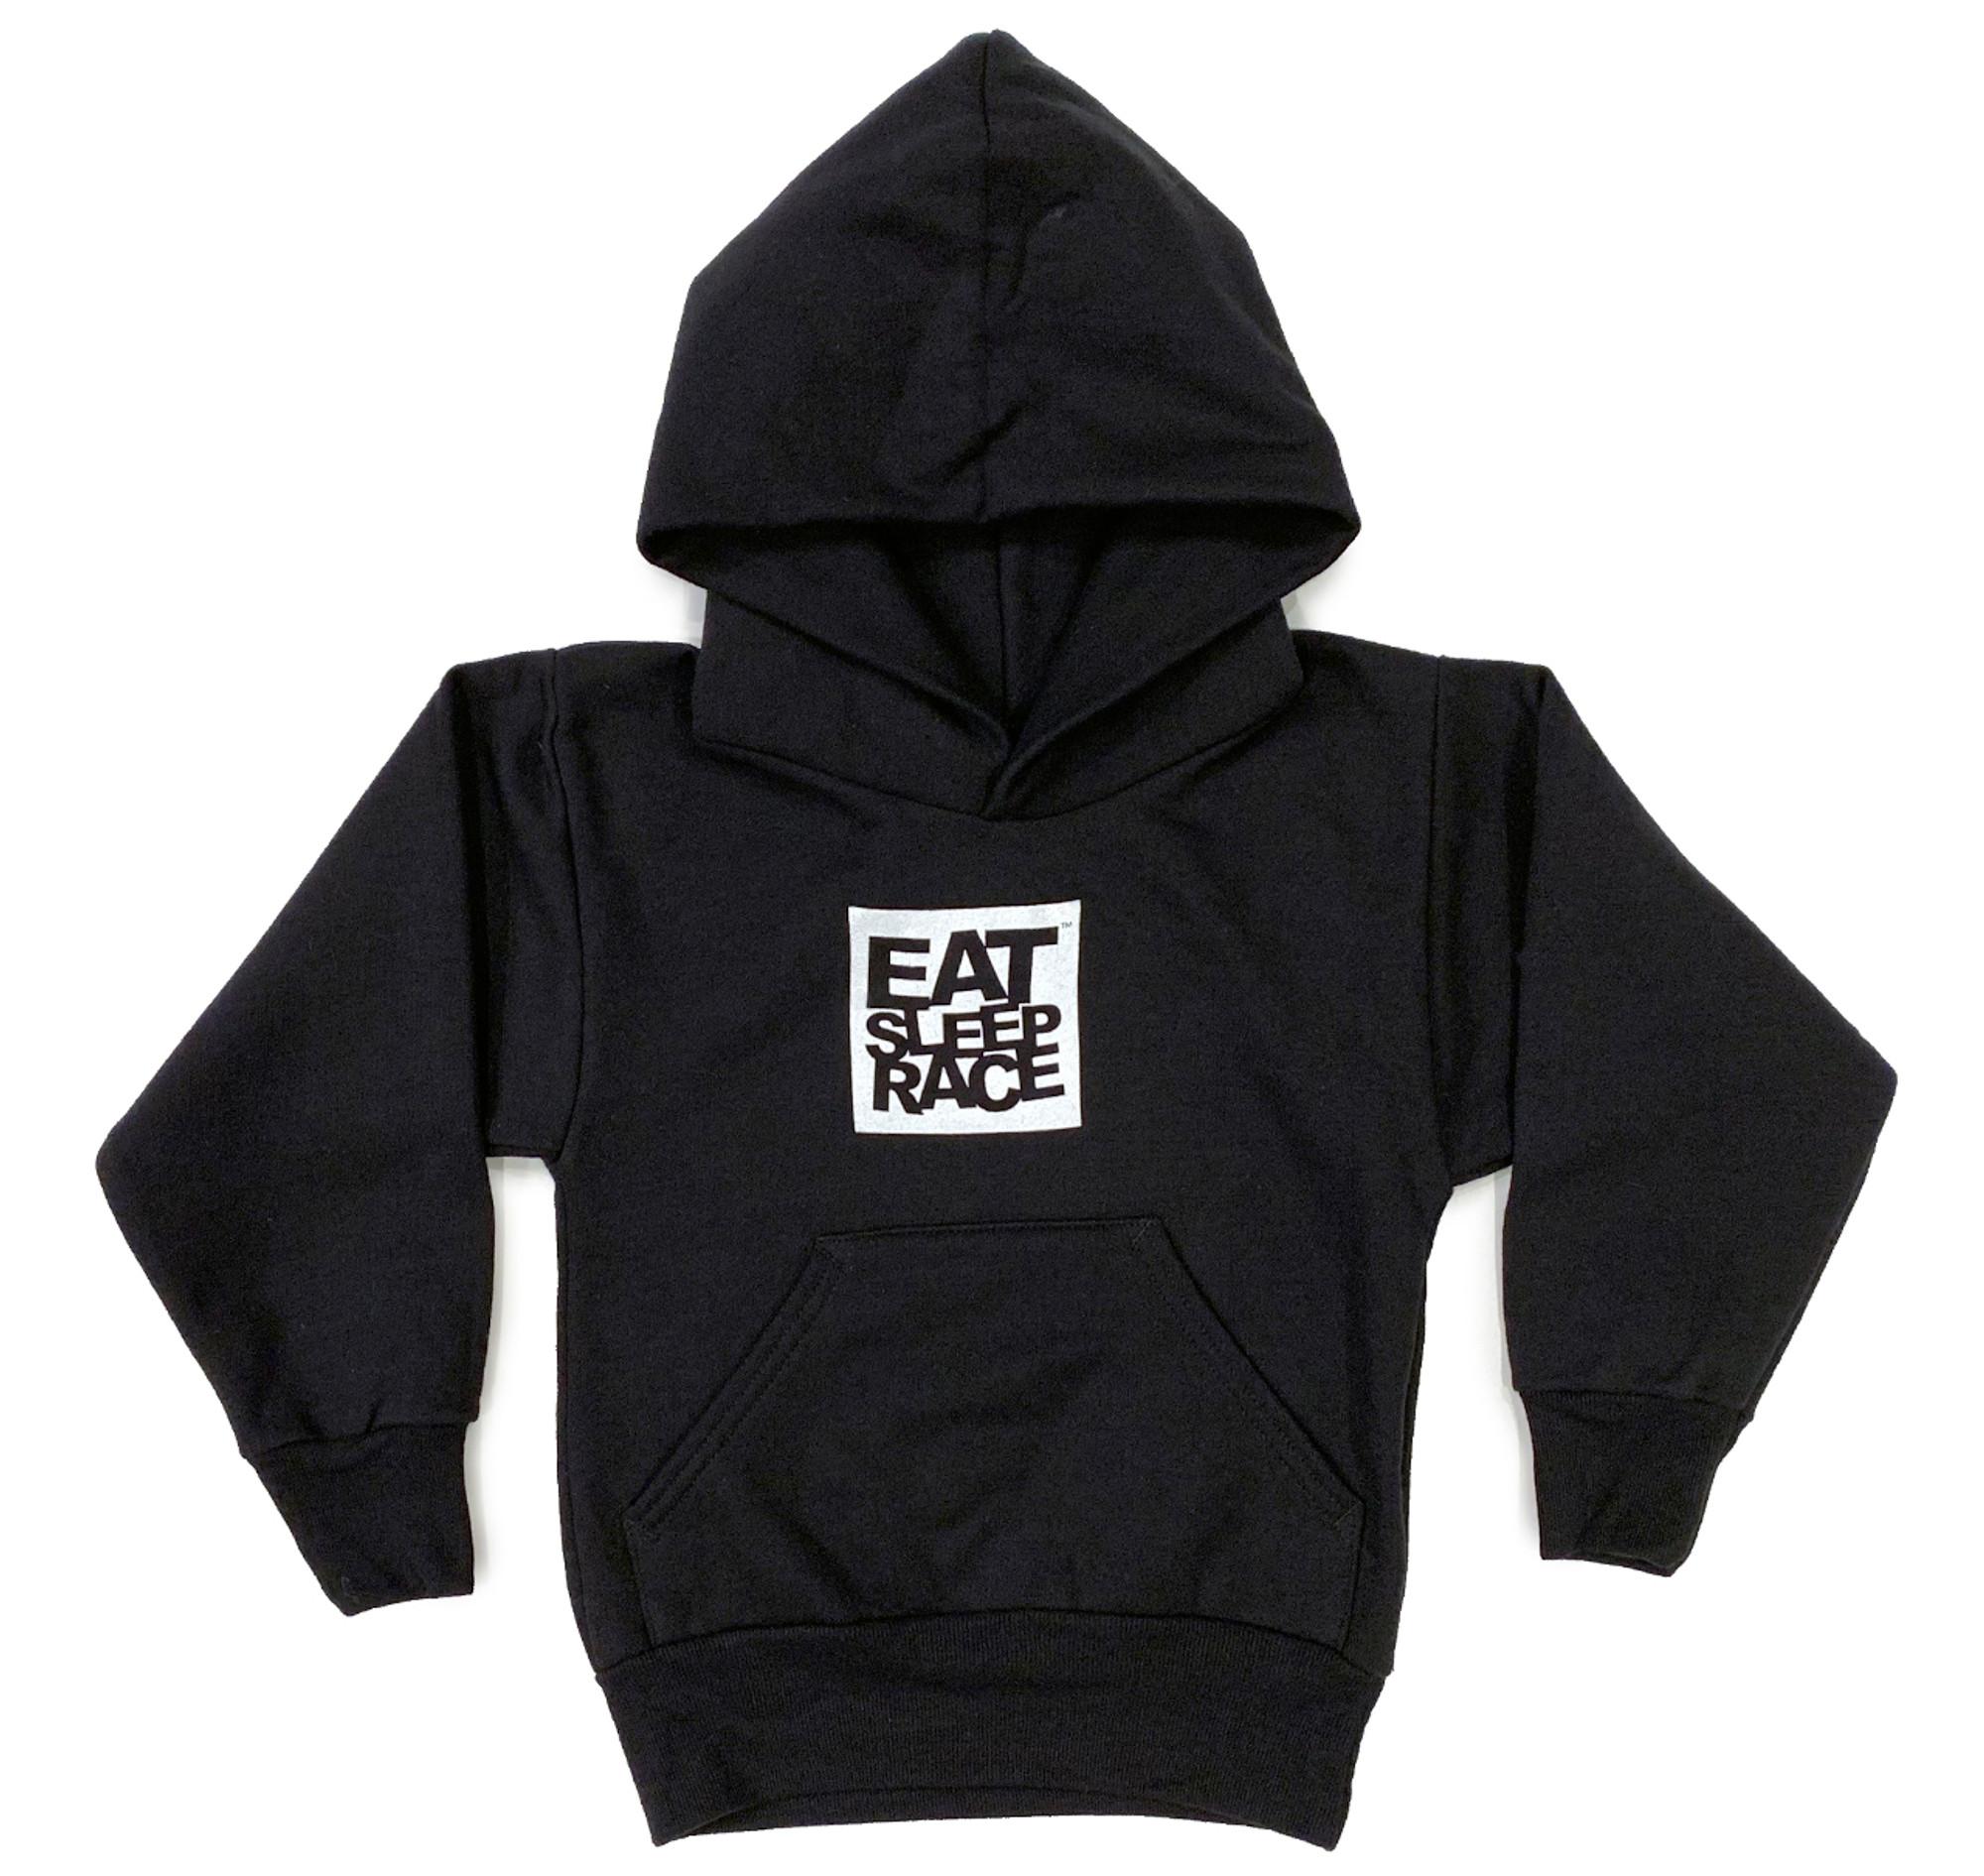 c4b7a37ab Kids Logo Square Pull Over Hoodie | Black/White - Eat Sleep Race - Racing  Lifestyle Apparel